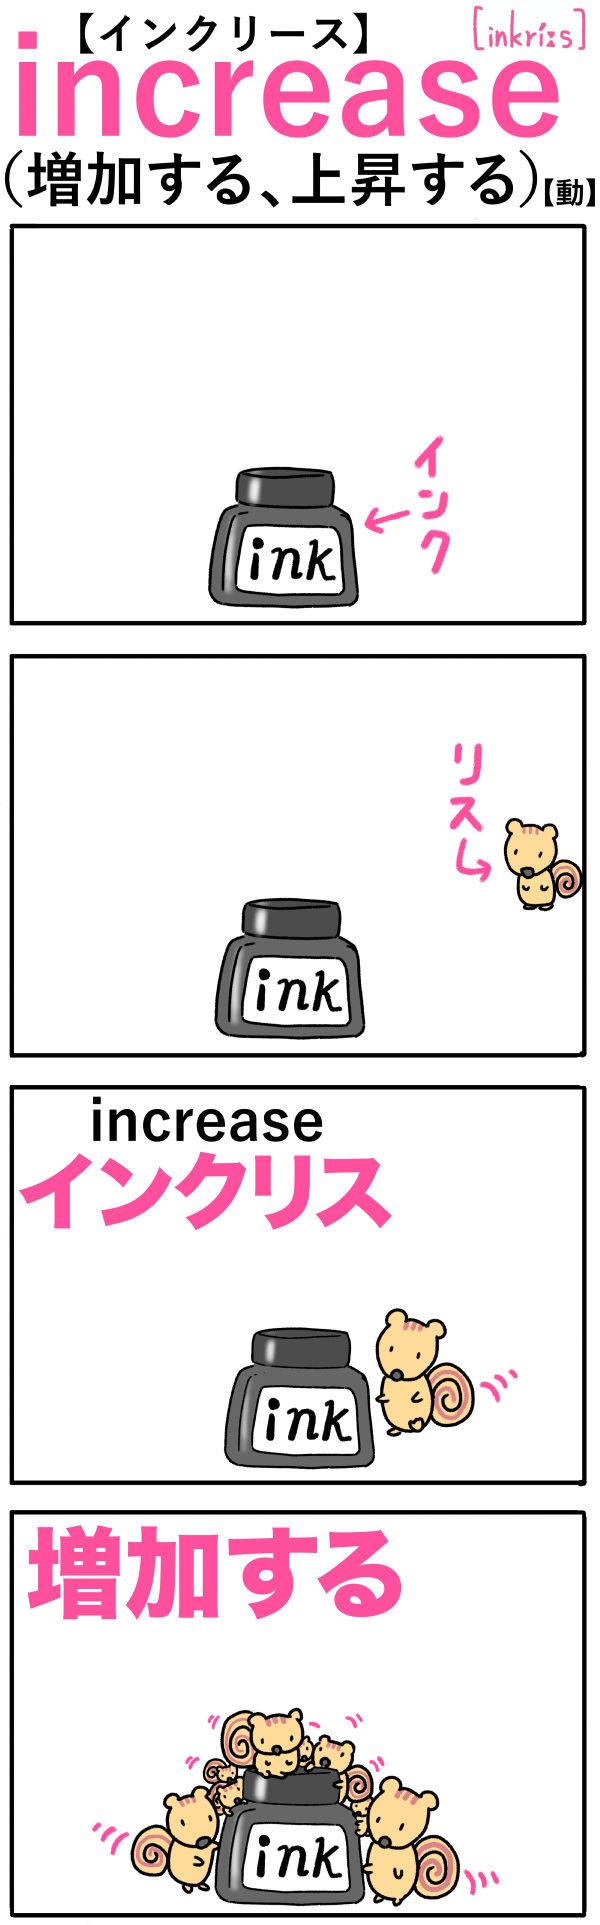 increase(増加する)の語呂合わせ英単語